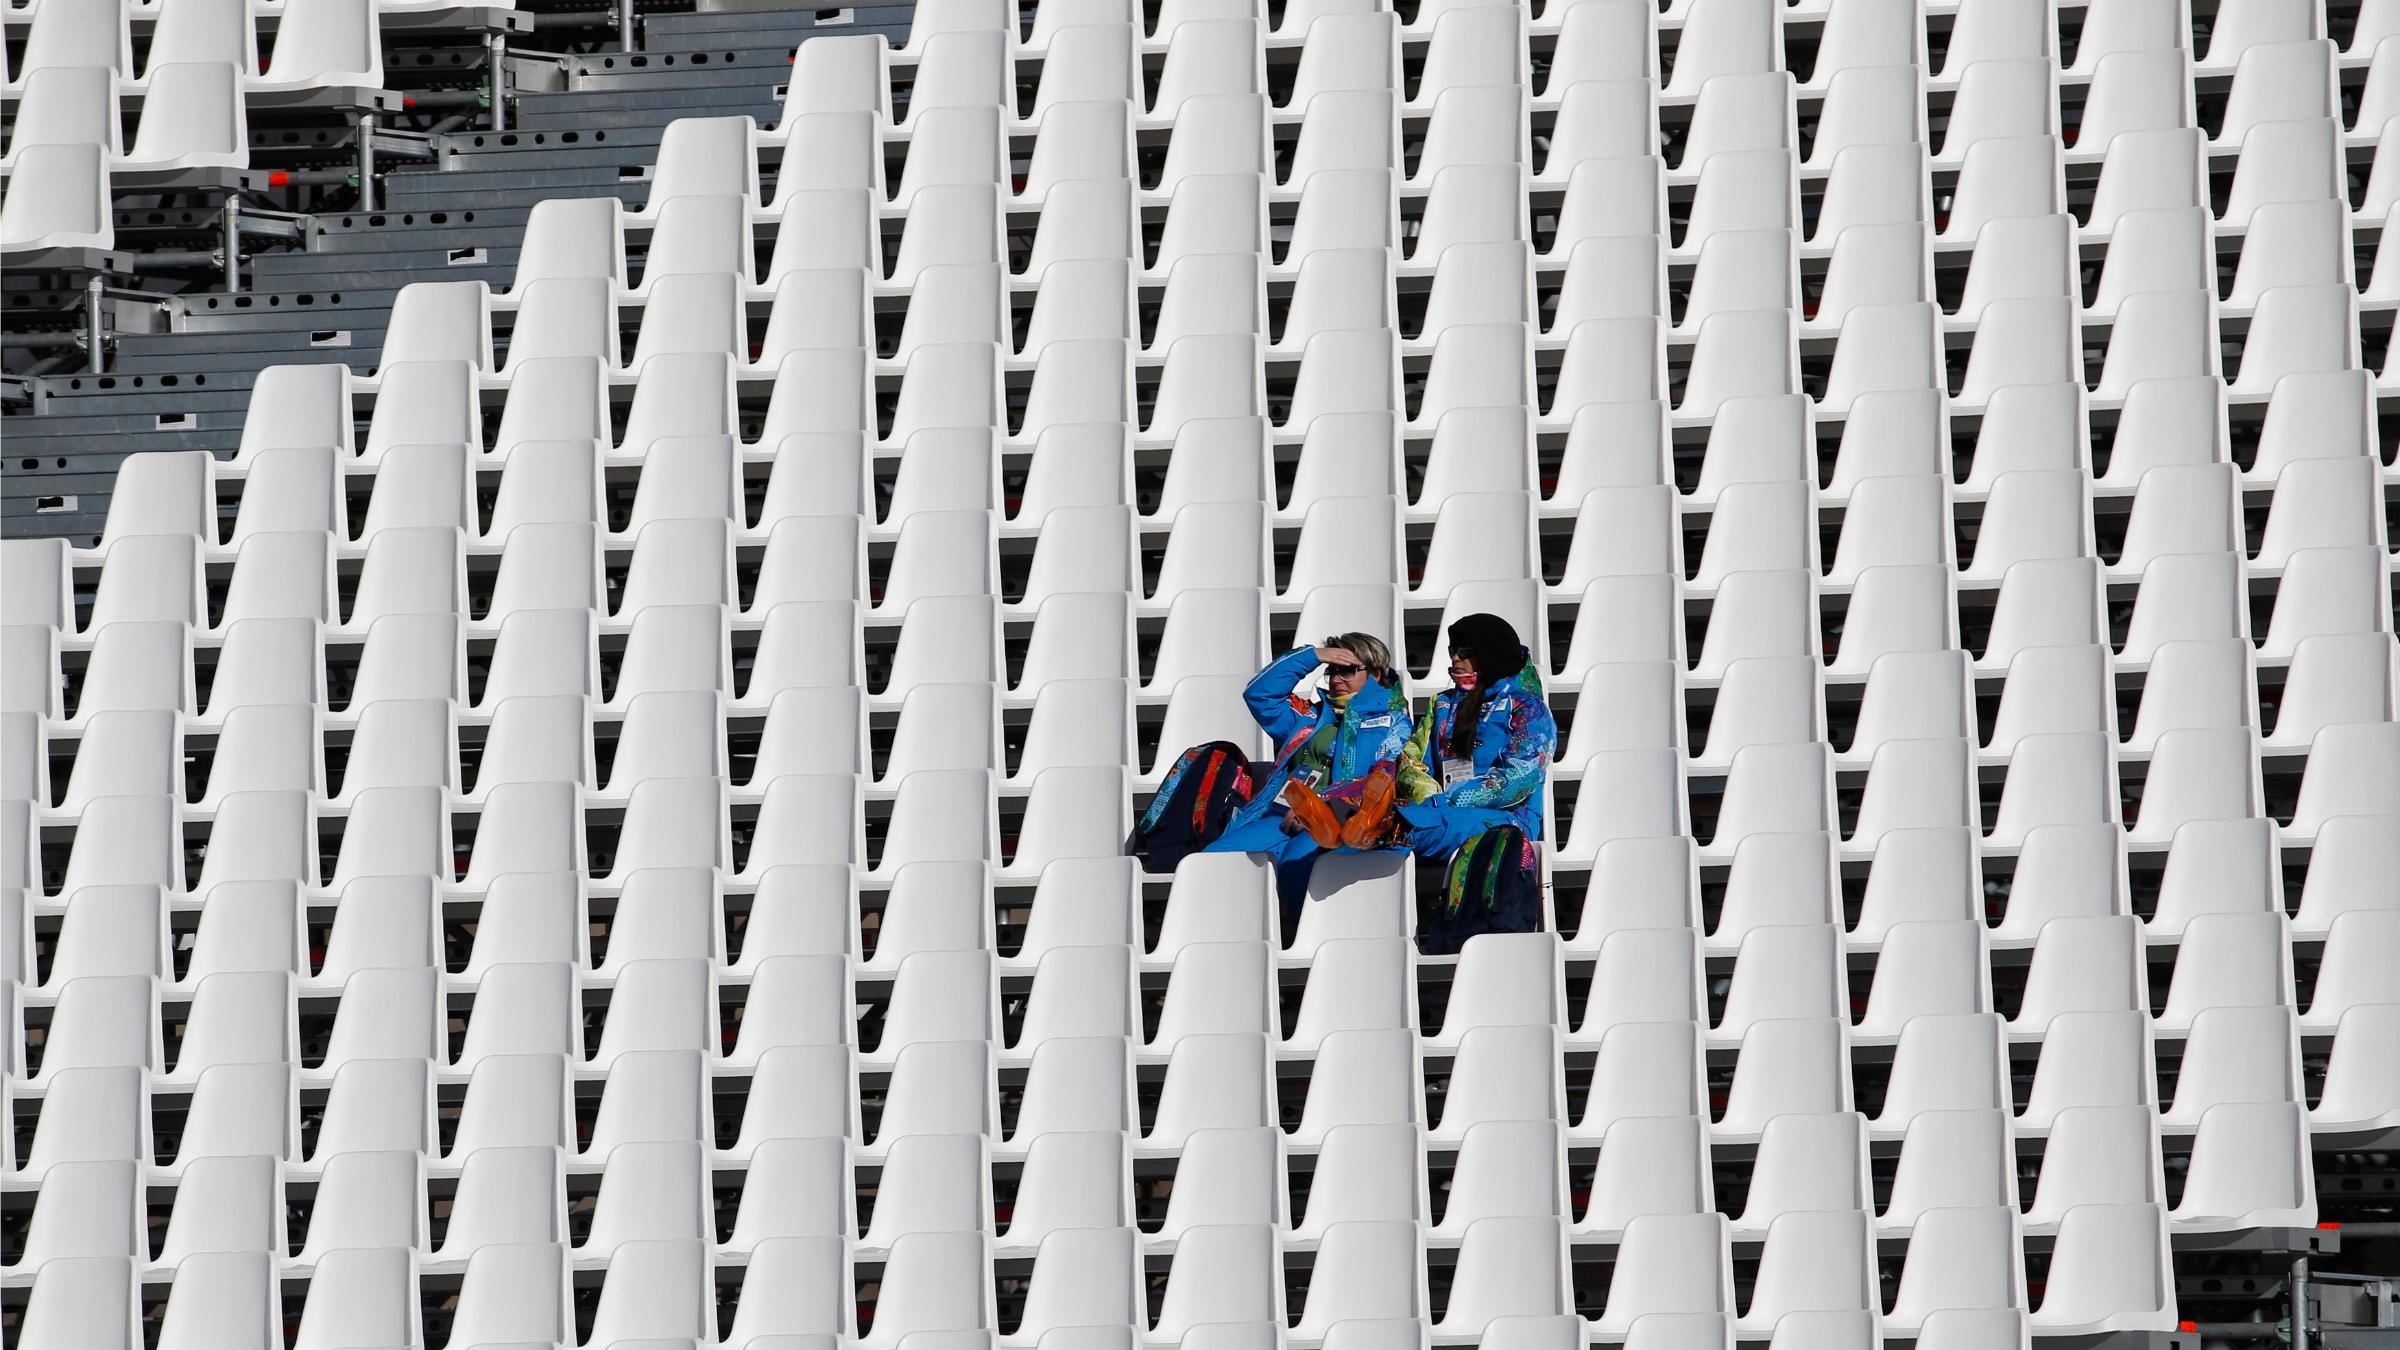 Sochi empty seats